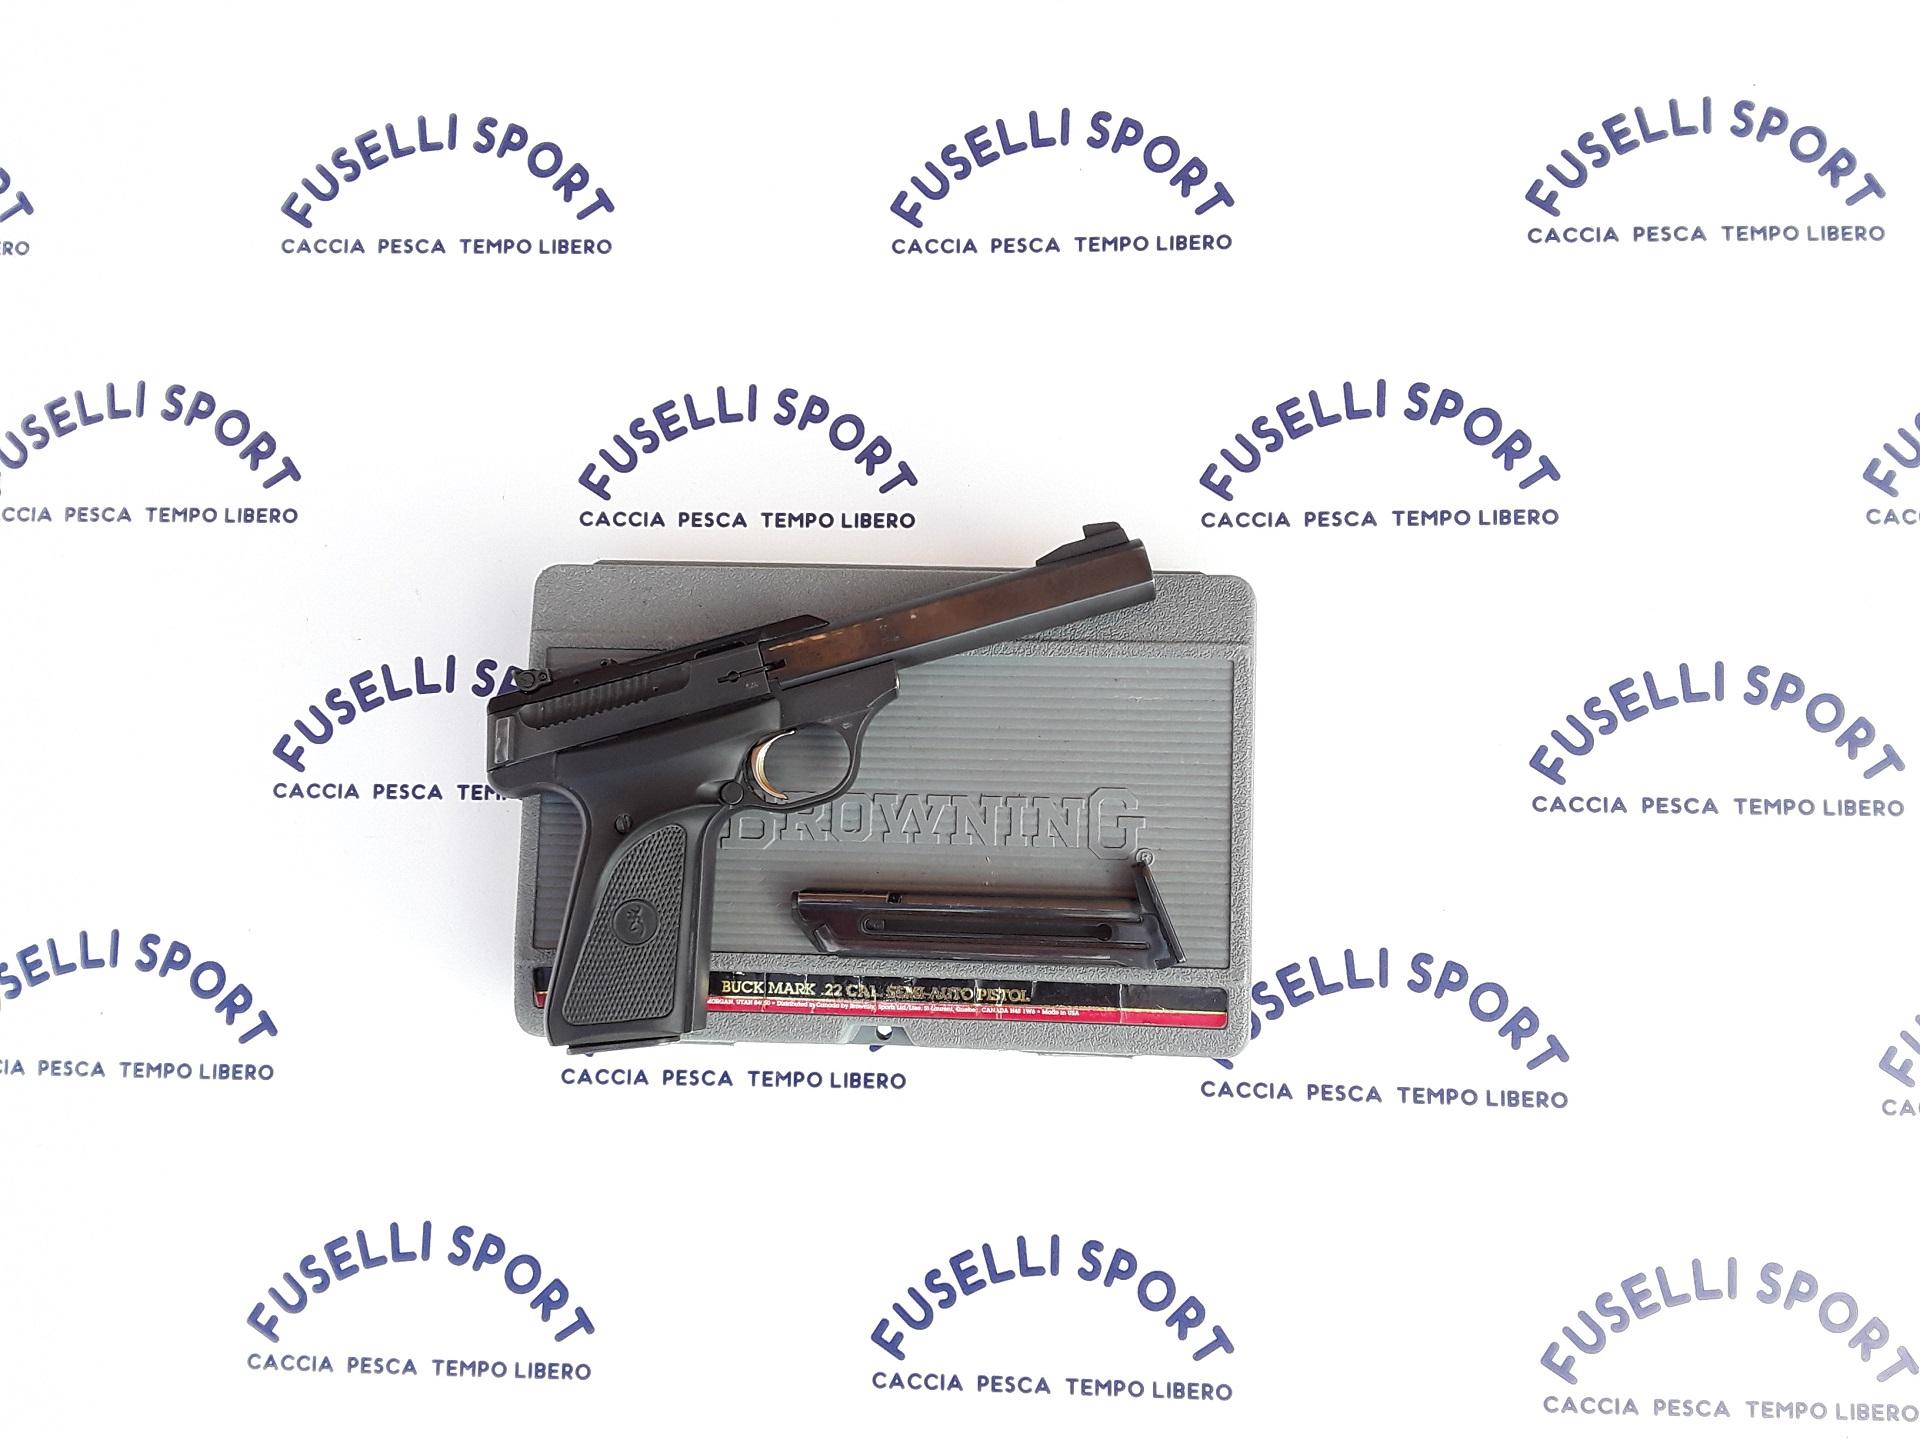 Browning calibro 22 LR